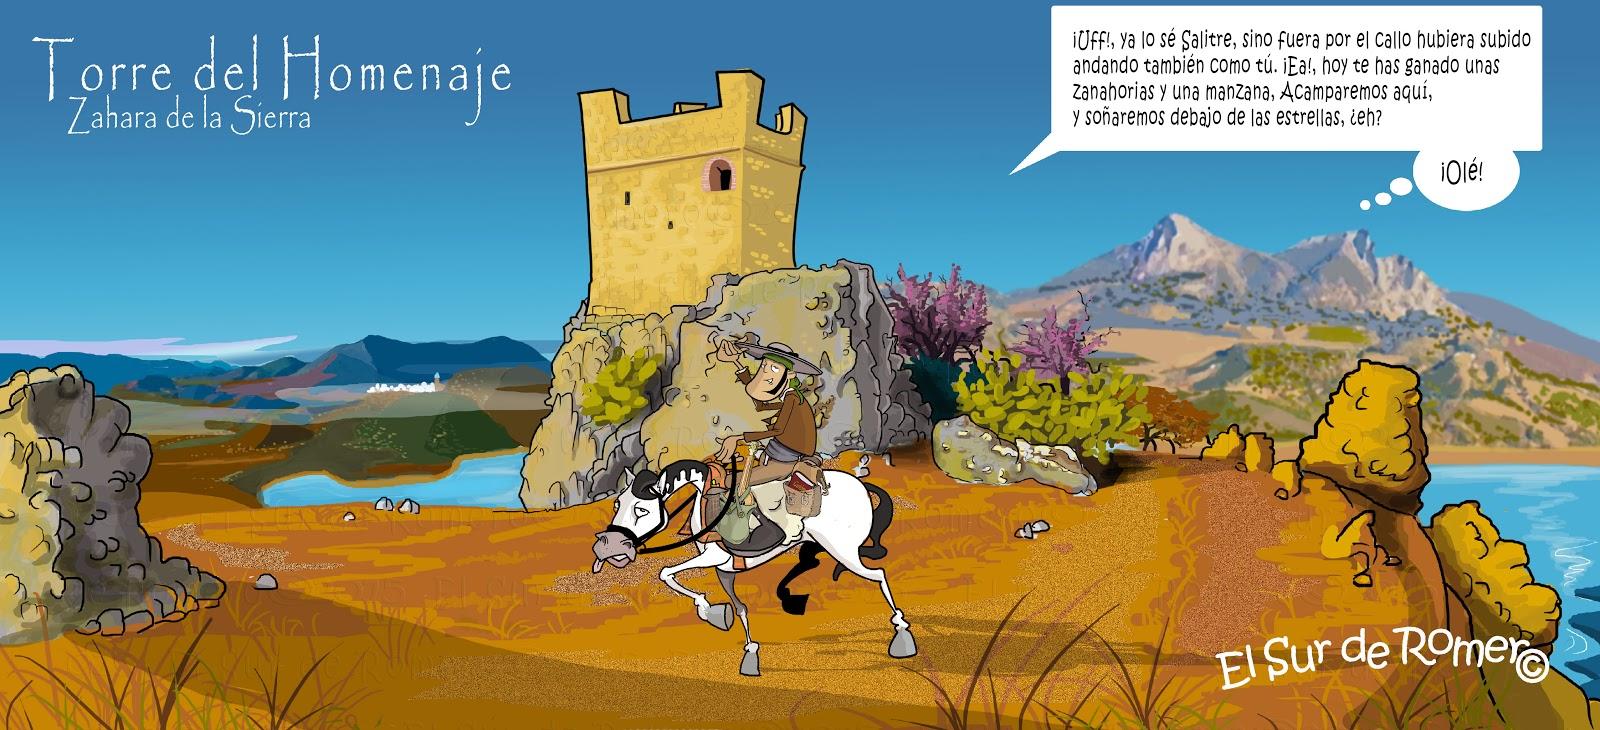 "<img src=""Torre del Homenaje.jpg"" alt=""Dibujos de Zahara de la Sierra""/>"